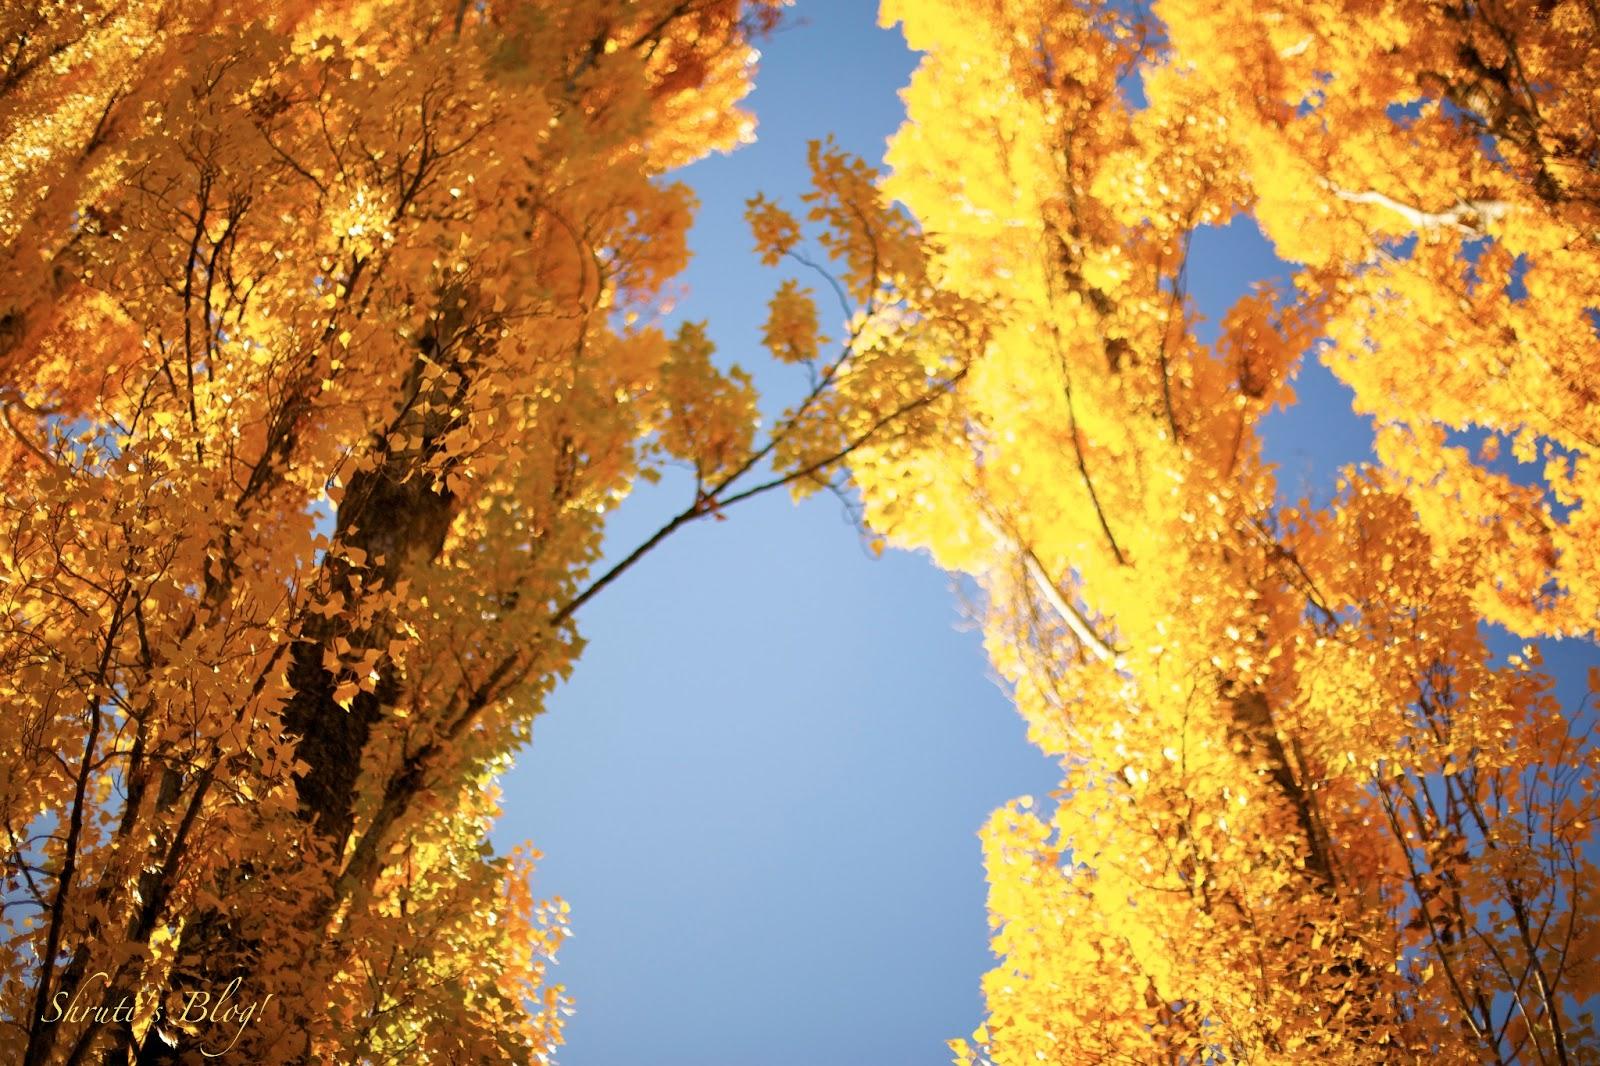 the magnificence of autumn in john keats to autumn To autumn - season of mists and mellow fruitfulness.